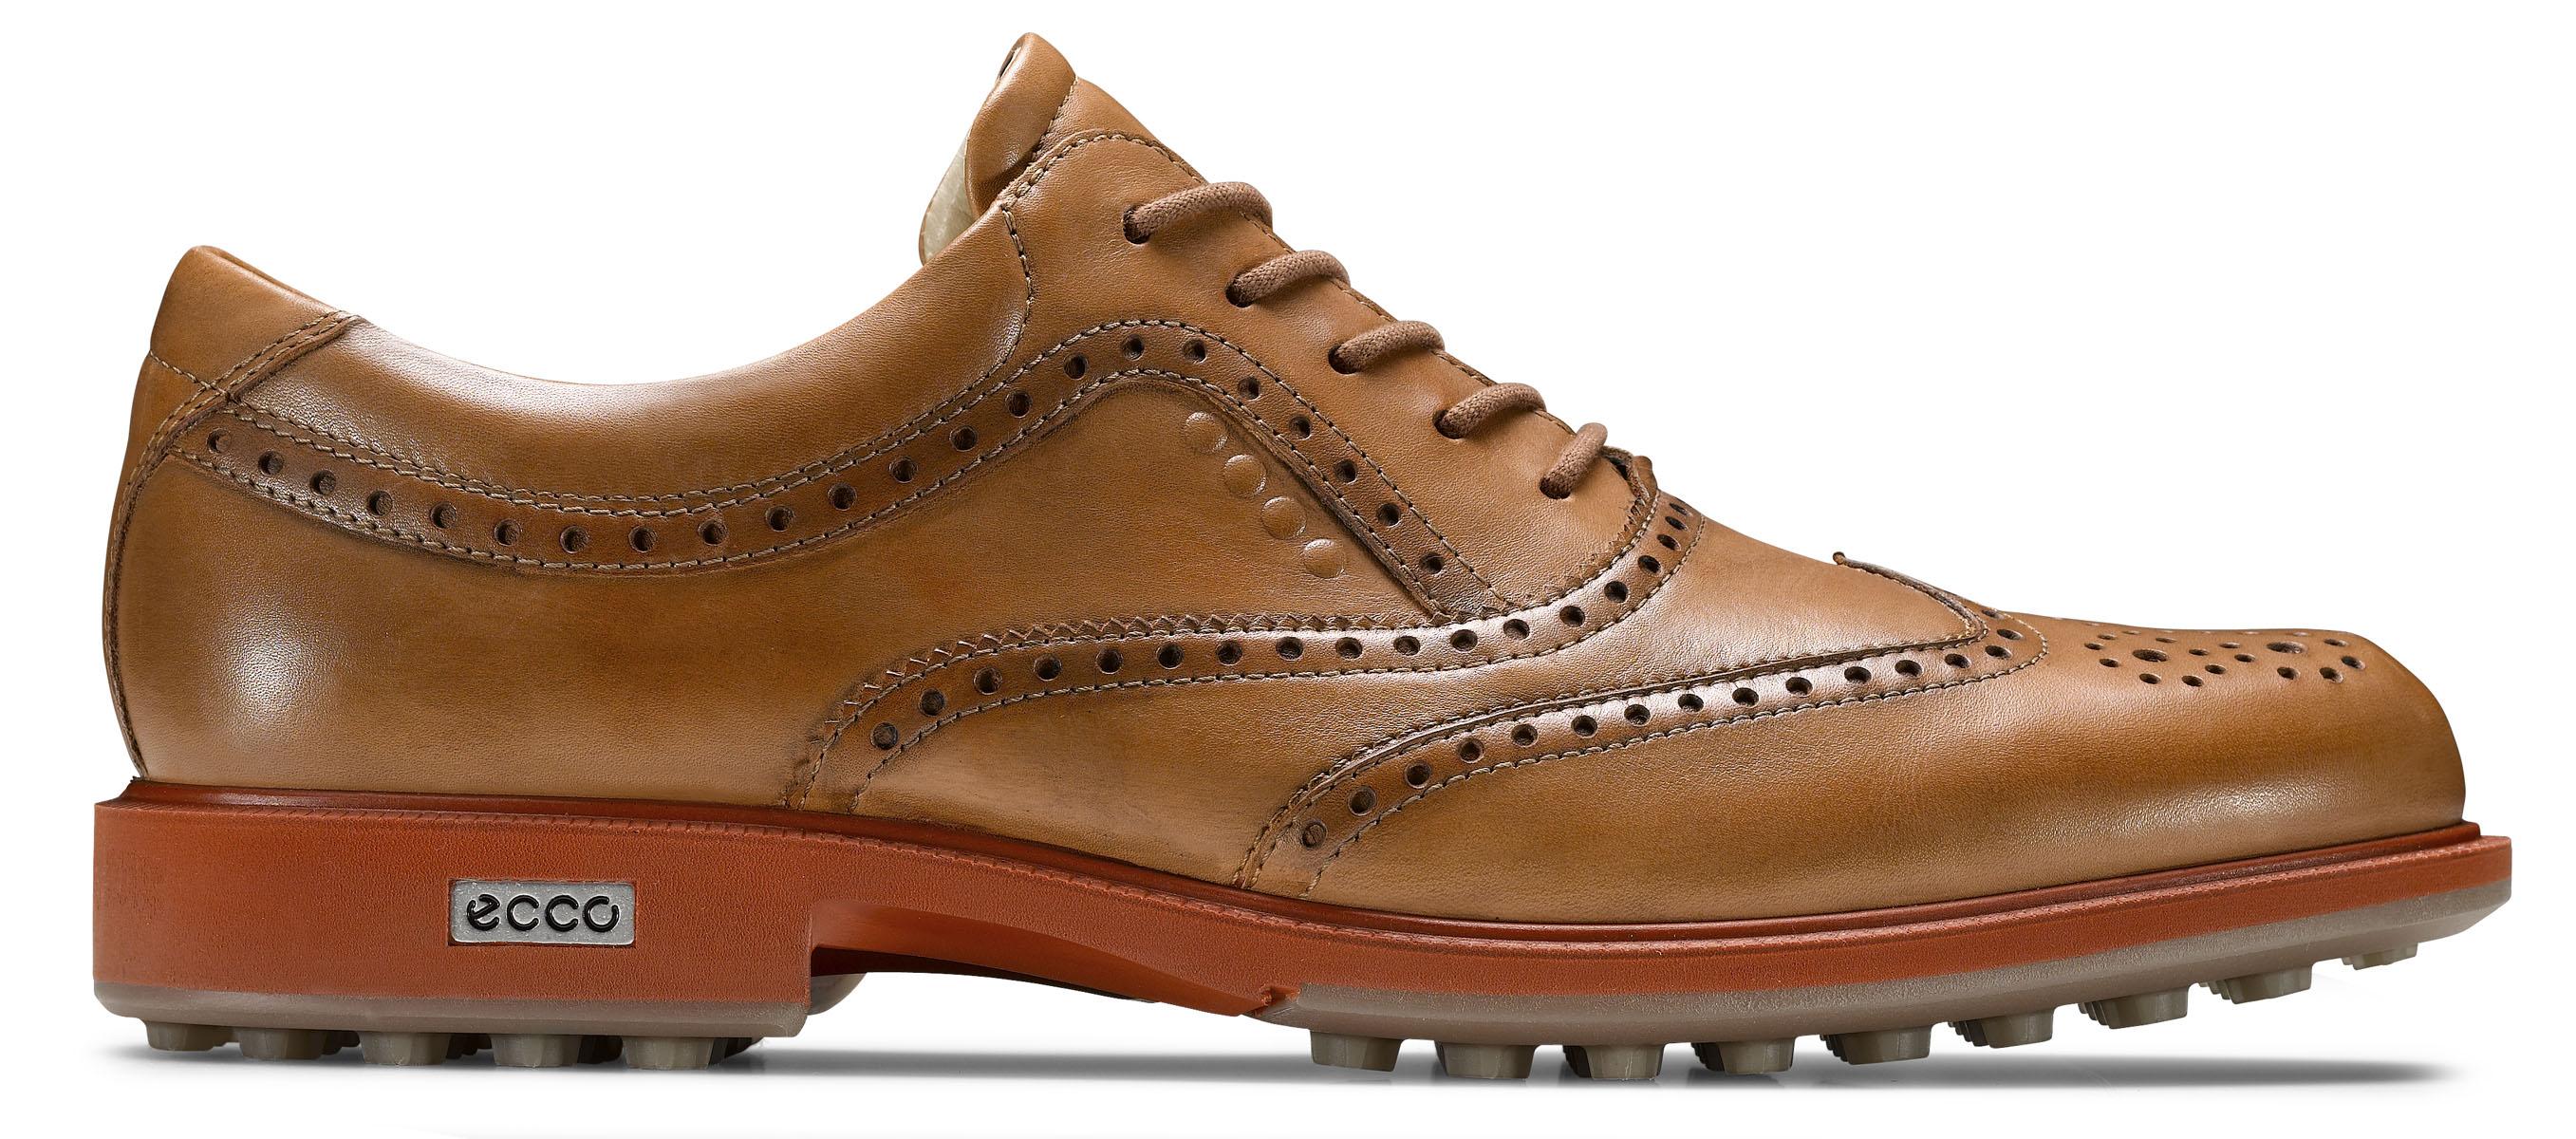 Ecco Shoe Repair  209061ddba7a